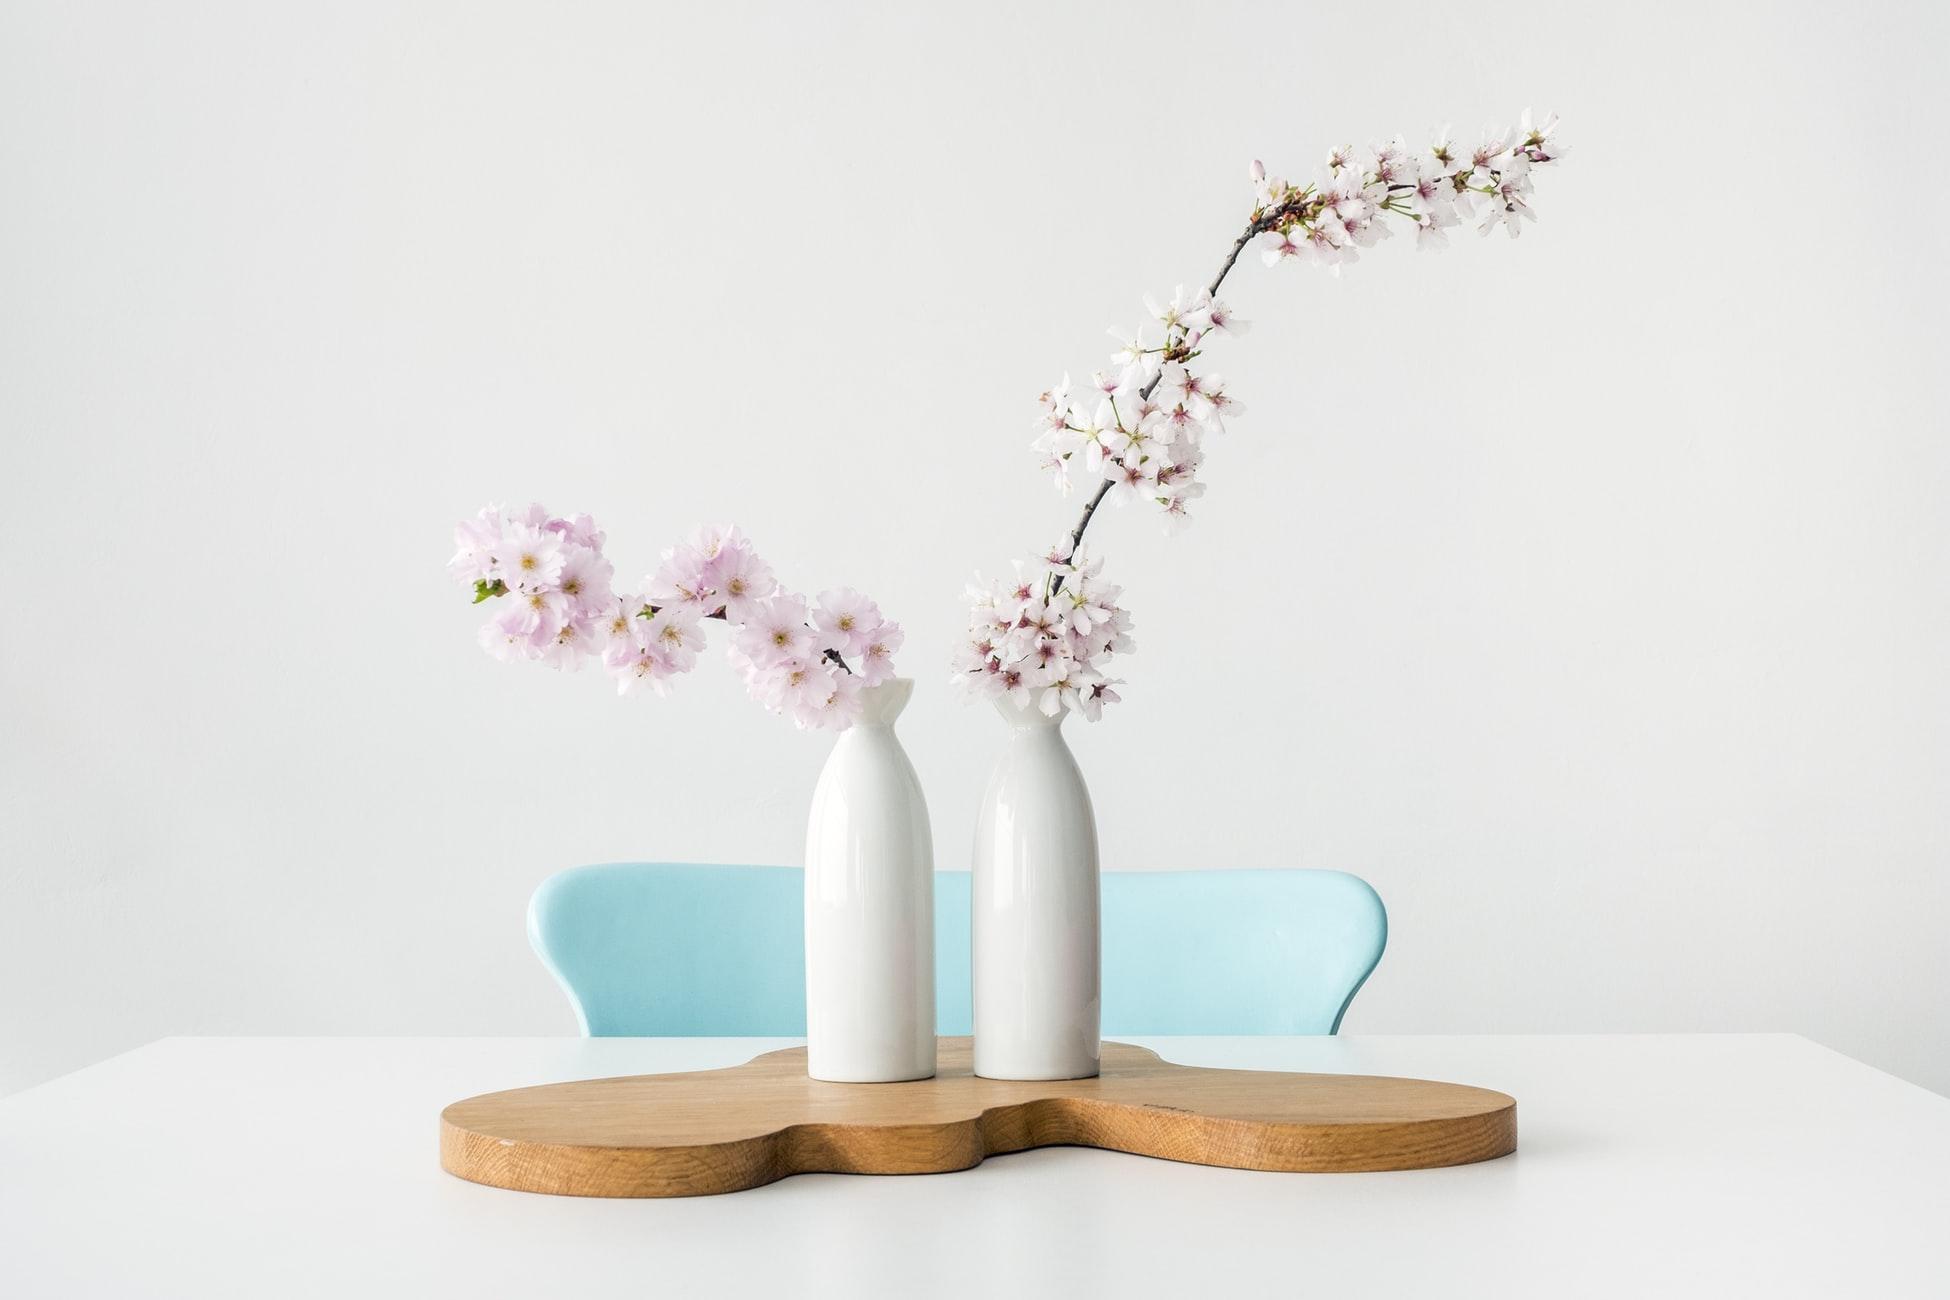 A minimalist interior design